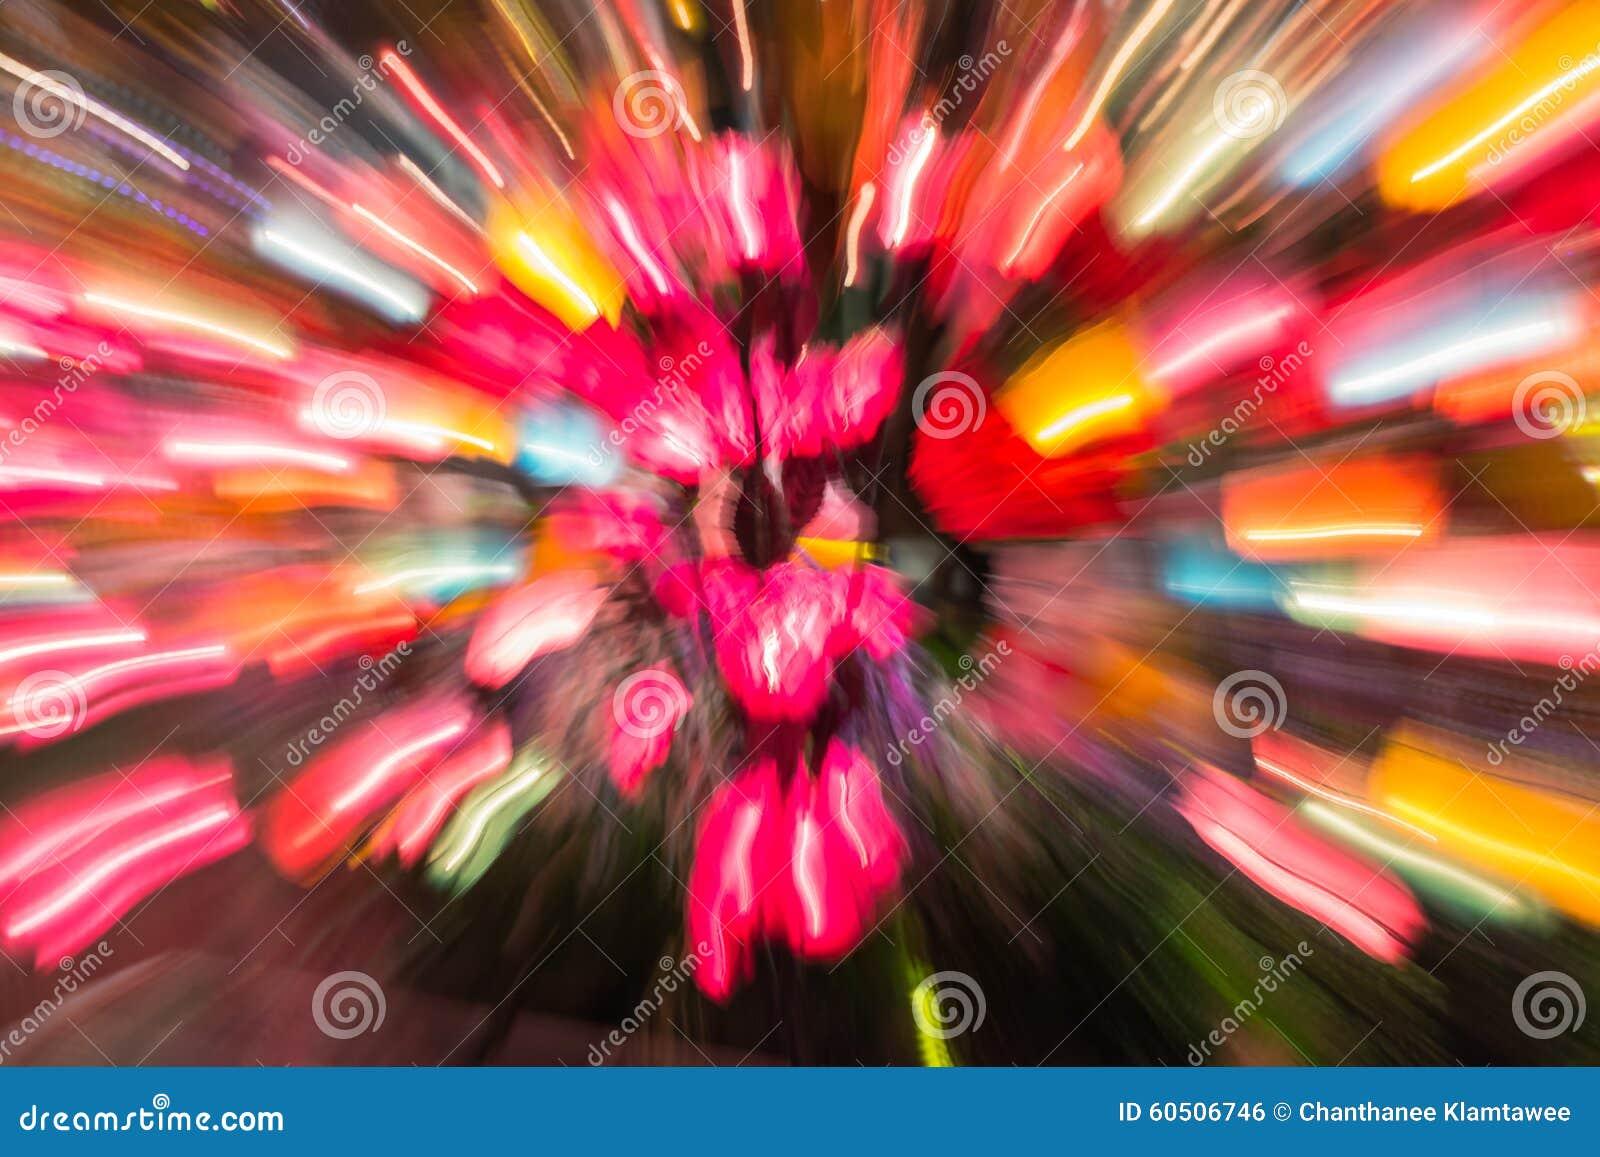 Colorful color of motion blur lamp light